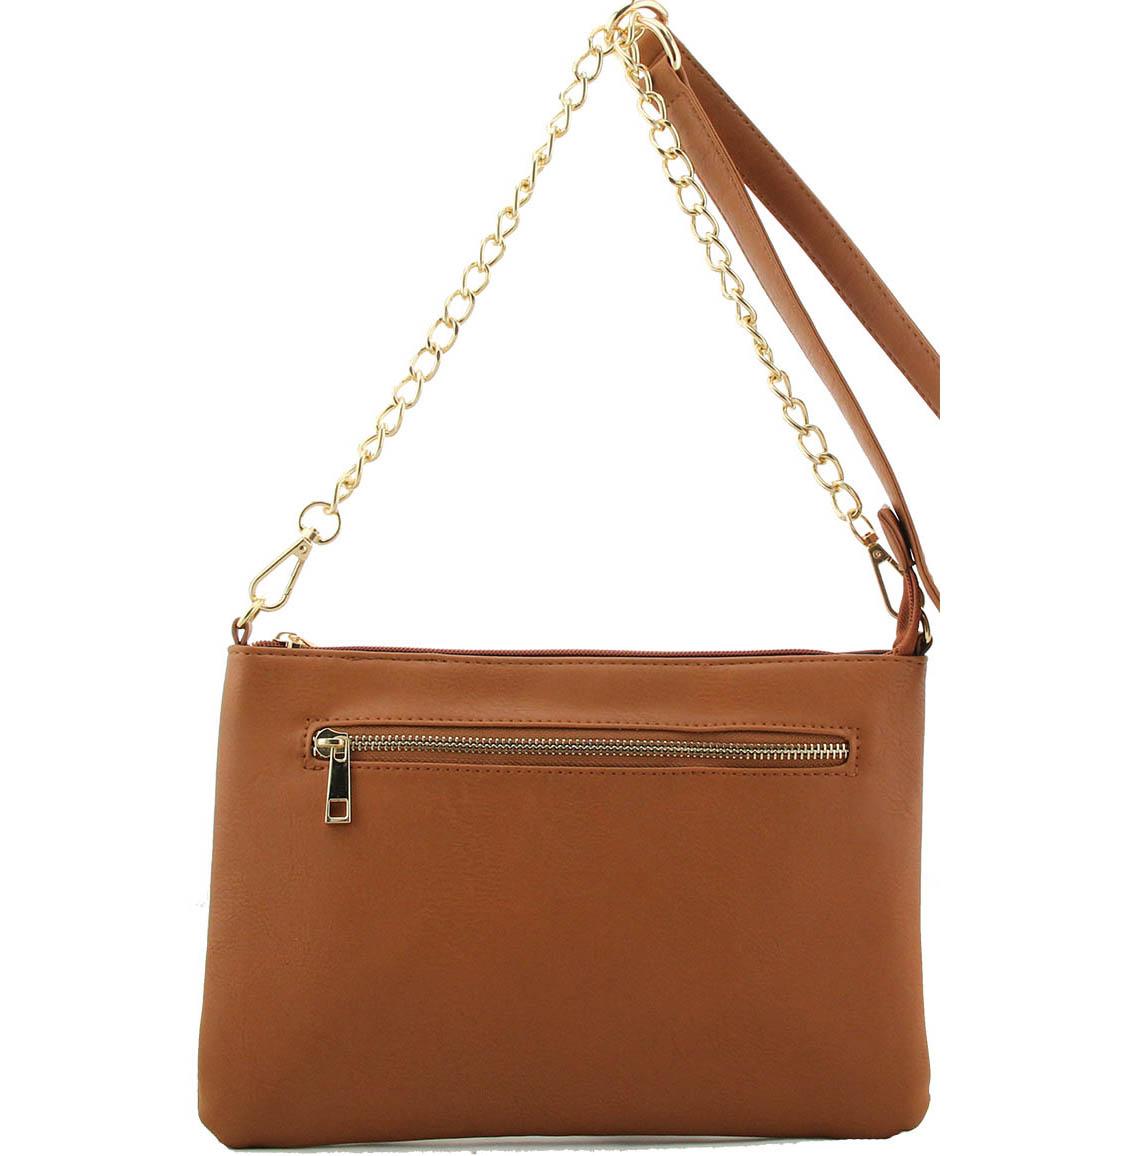 b3c26ef6f9c2 Ulrica Fashion Designer Handbag tan ~ BAGZONE - Suppliers of Fashion ...